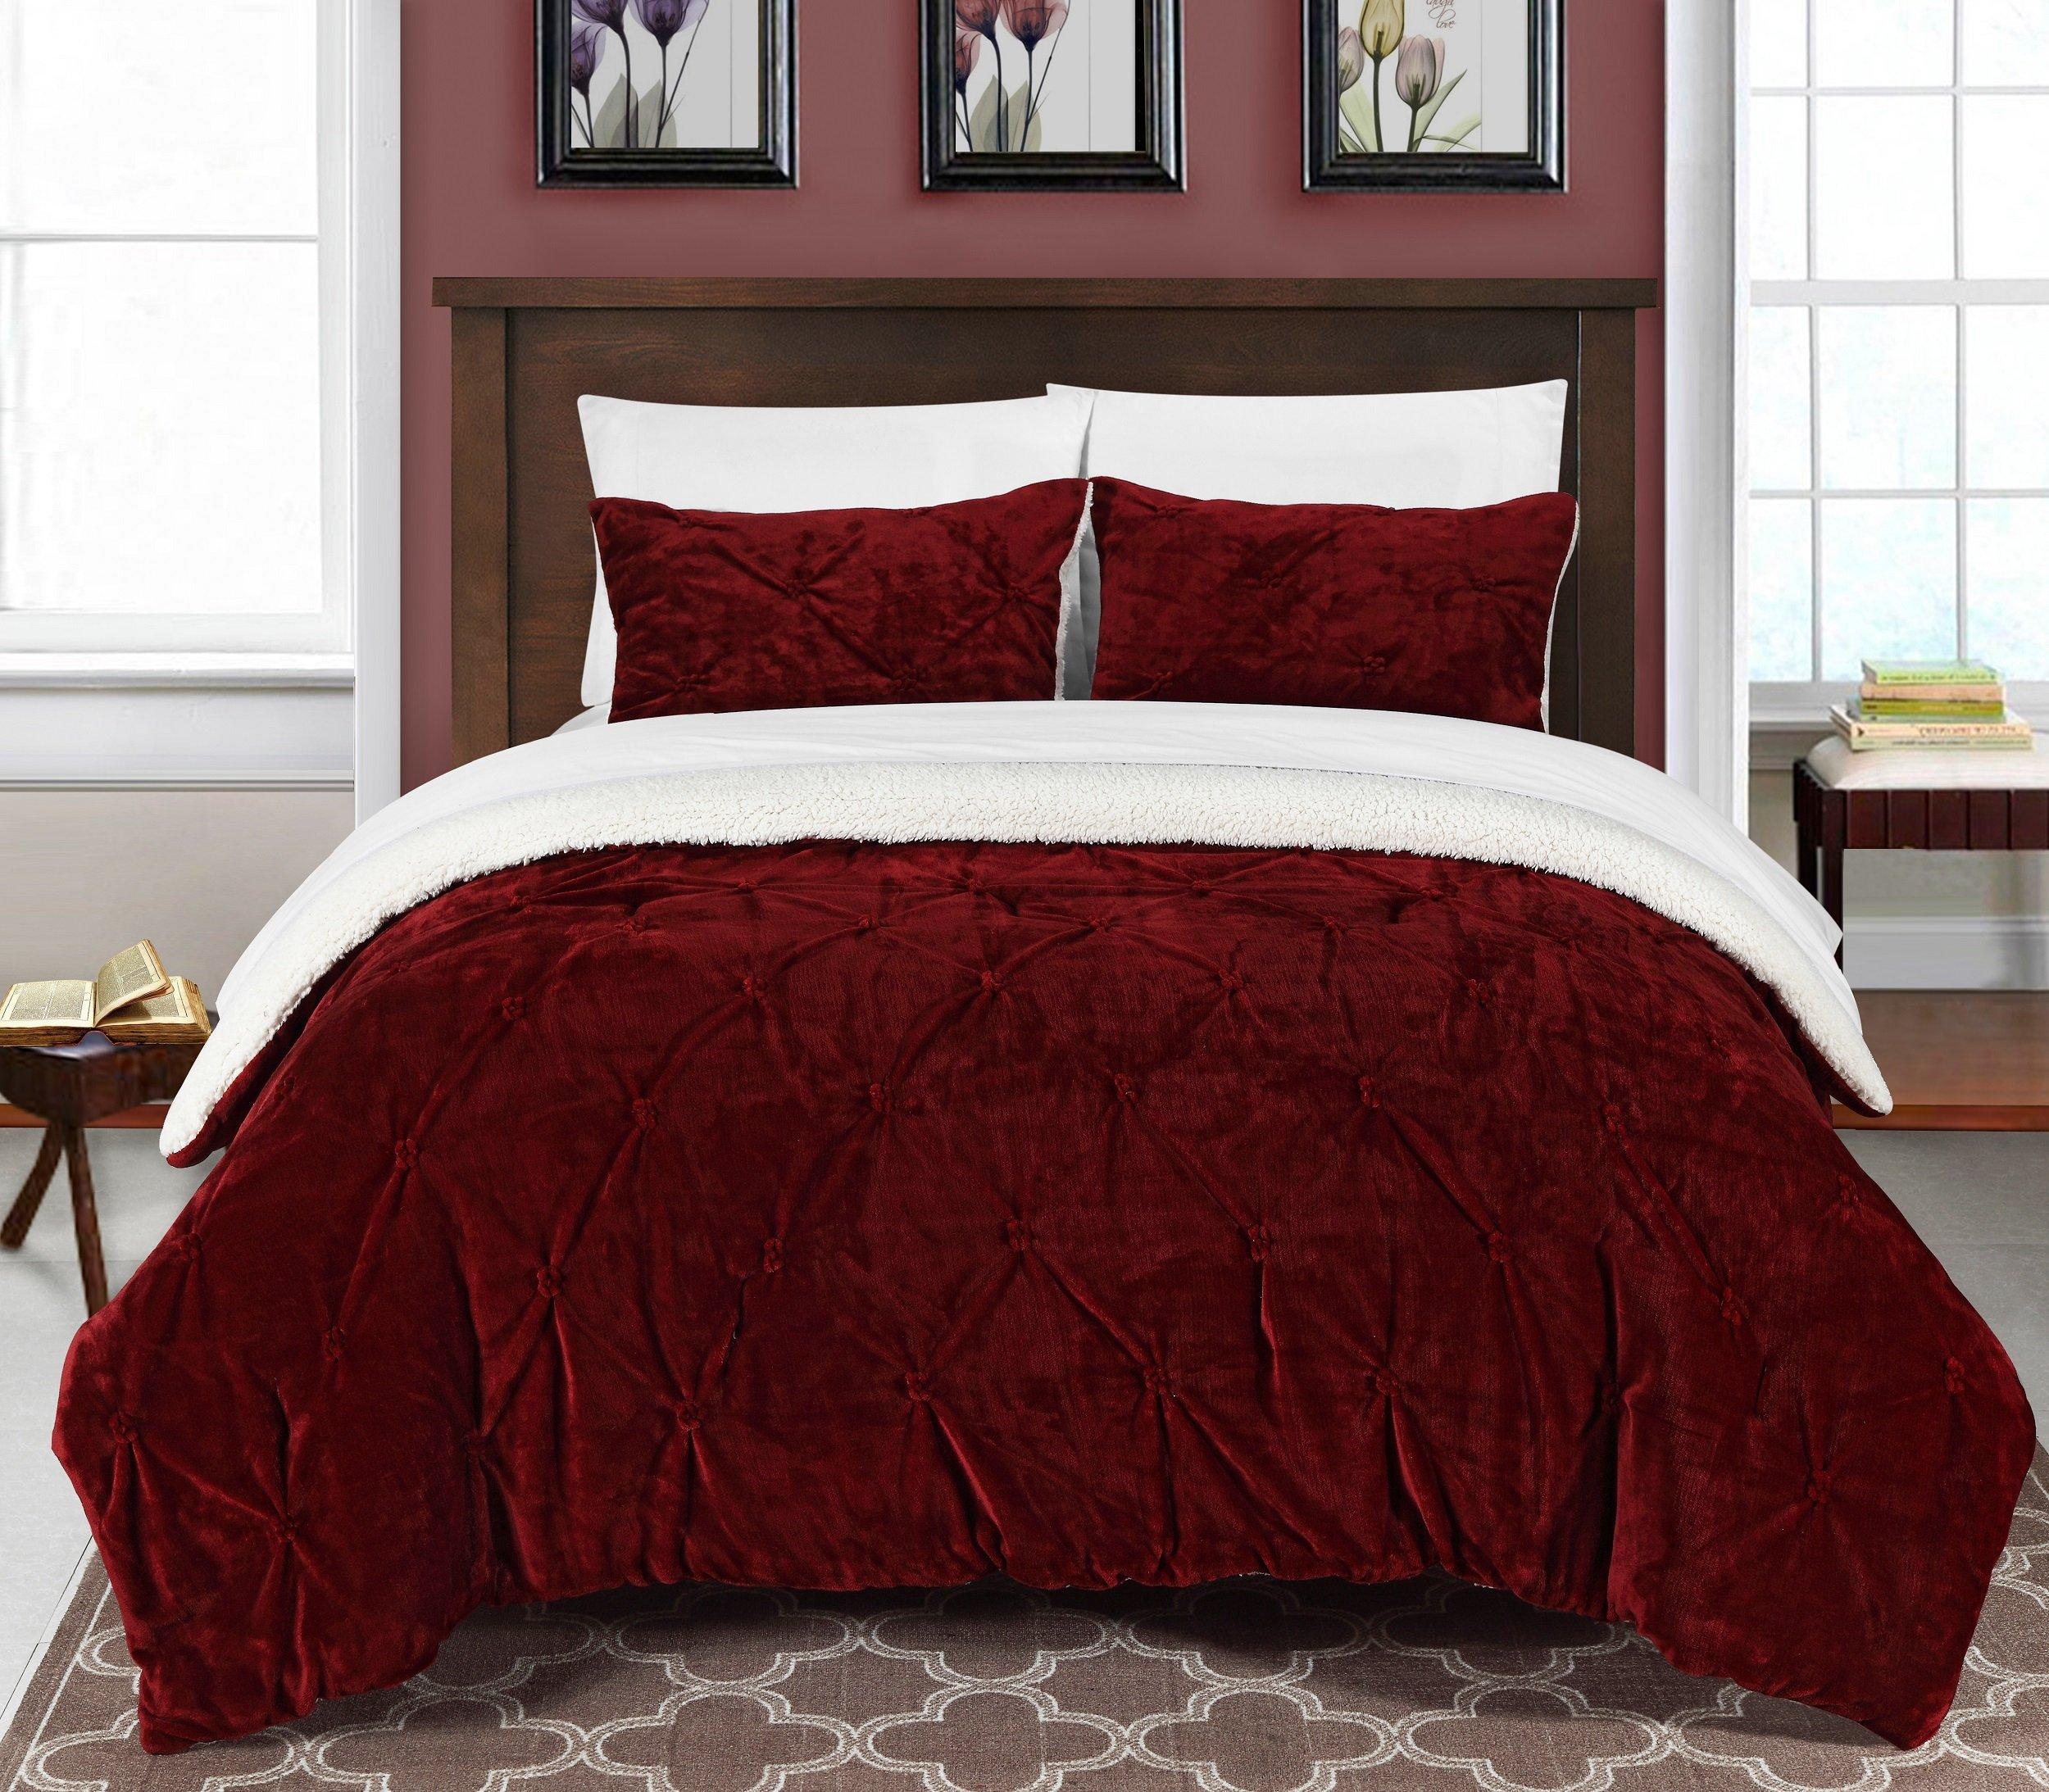 Chic Home 3 Piece Josepha Pinch Pleated Ruffled & Pintuck Sherpa Lined Comforter Set, Queen, Burgundy